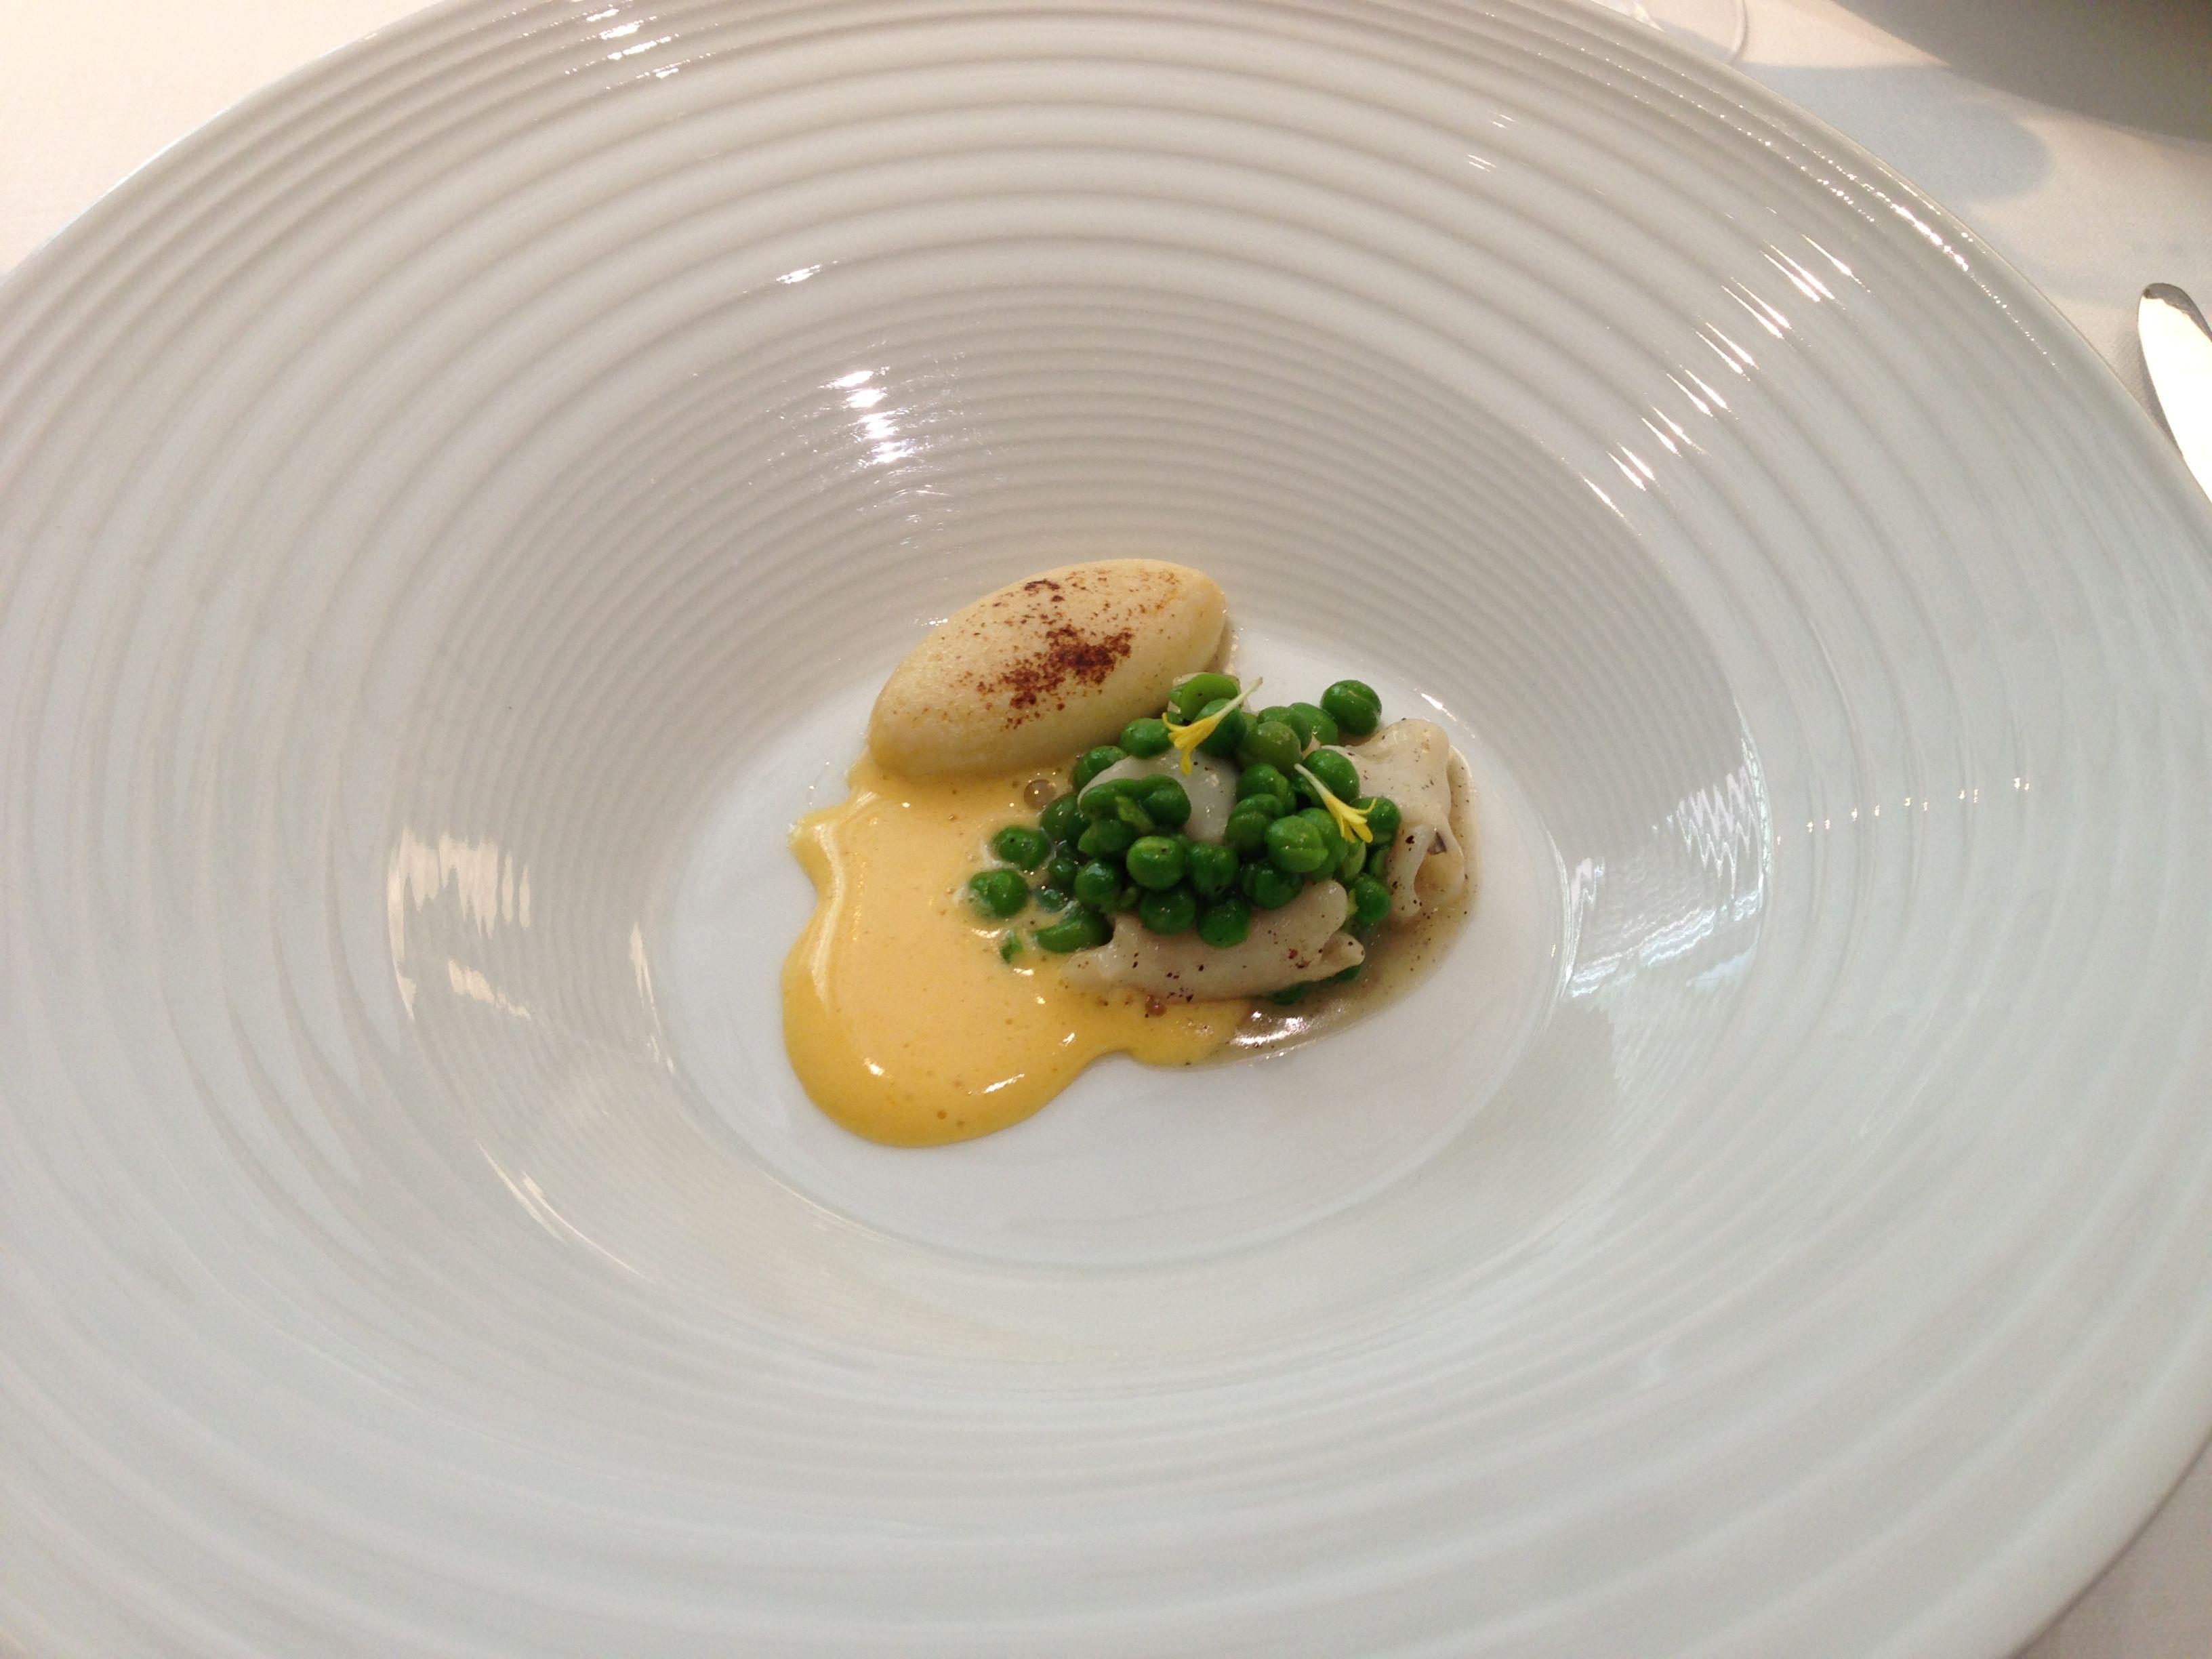 Peas, cod, omelette at Ramon Freixa in Madrid Spain